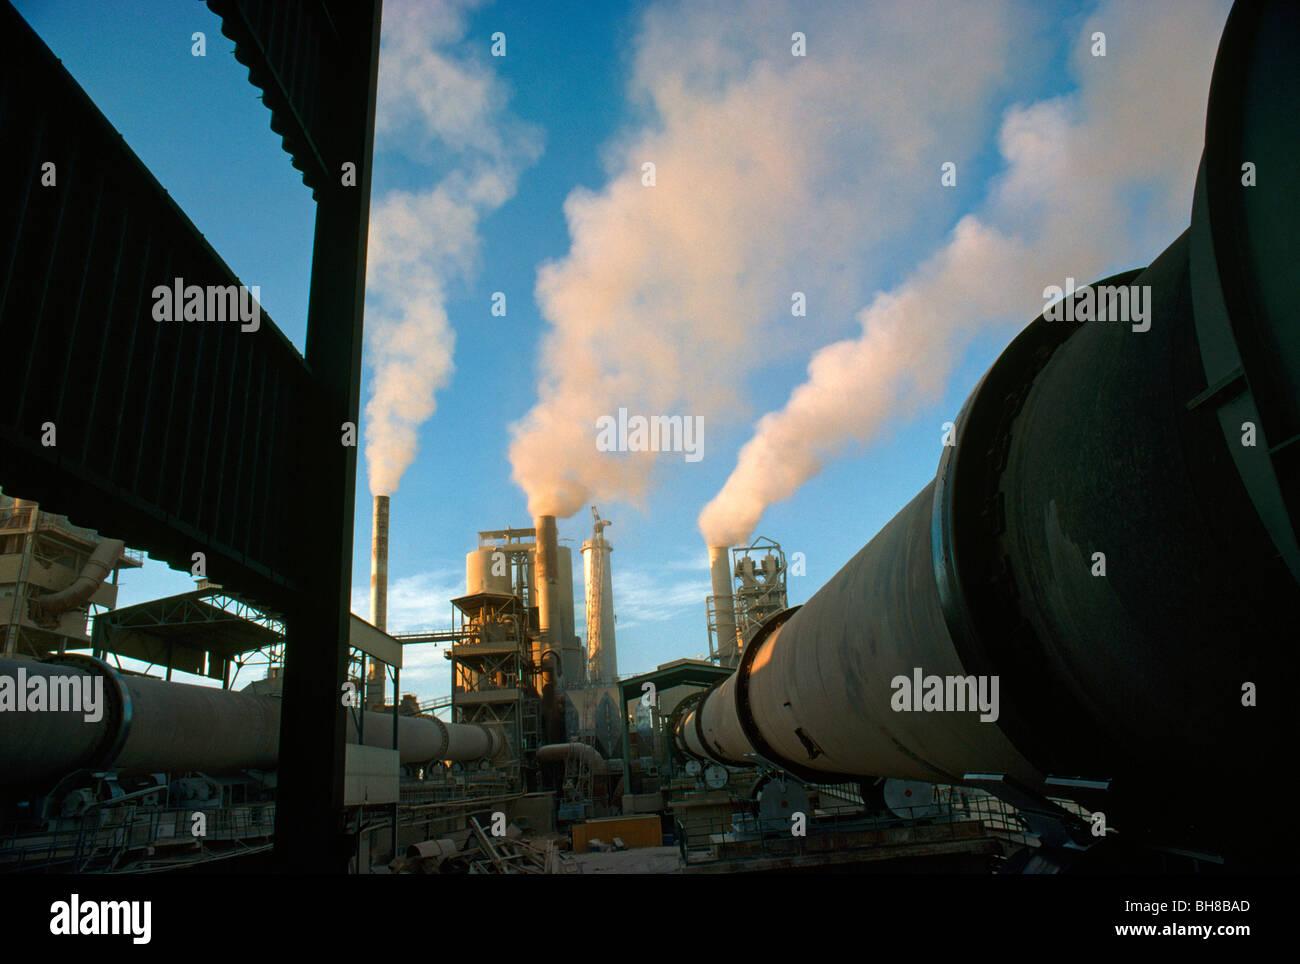 Jeddah Saudi Arabia Cement Factory Smoke Stacks Stock Photo